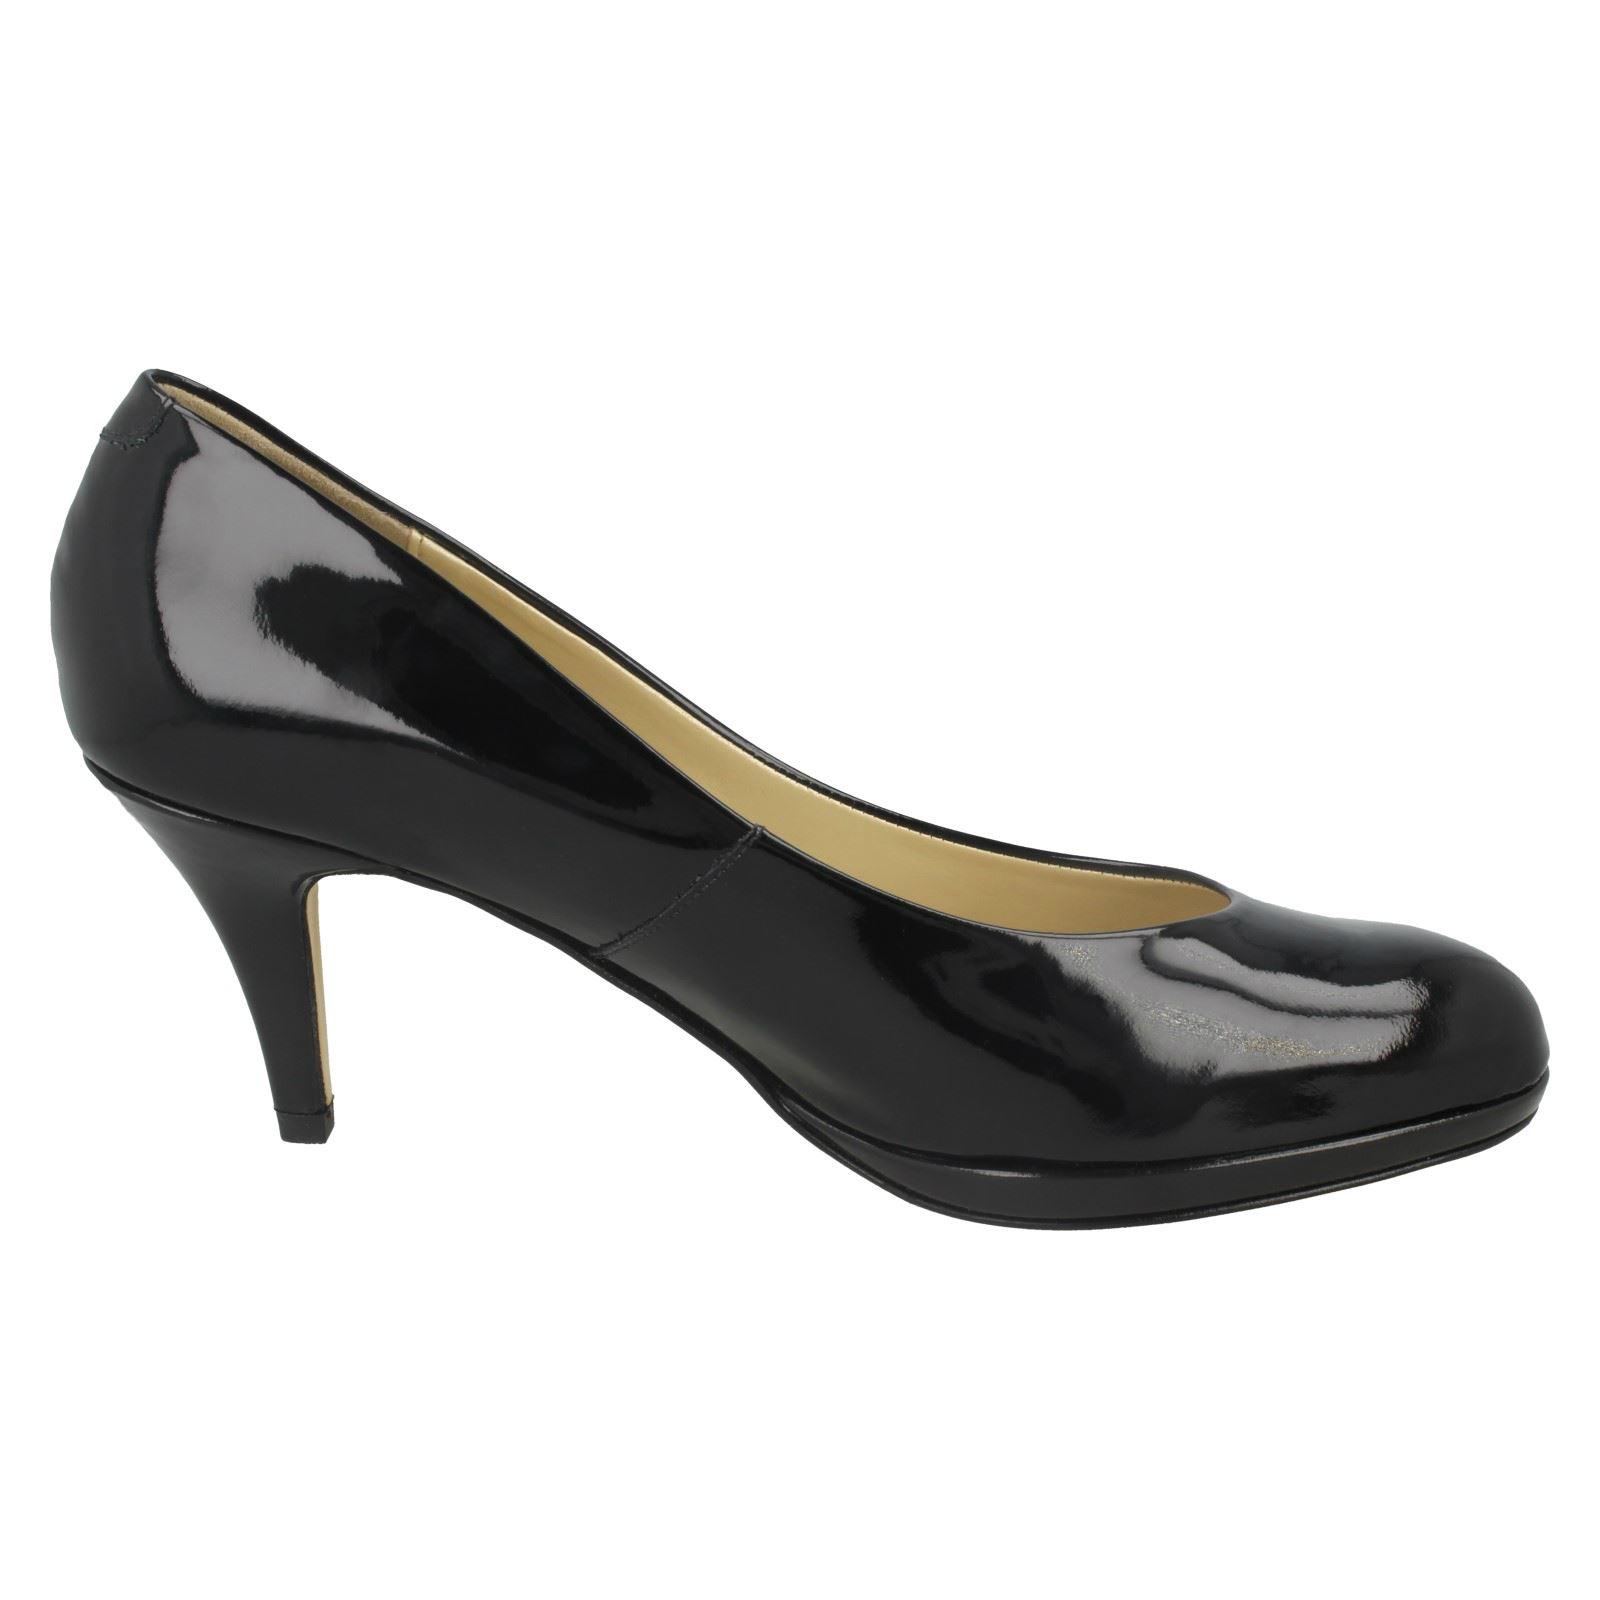 Femmes Van Smart Dal Smart Van Chaussures à Talon * Filby * 0c8ed9